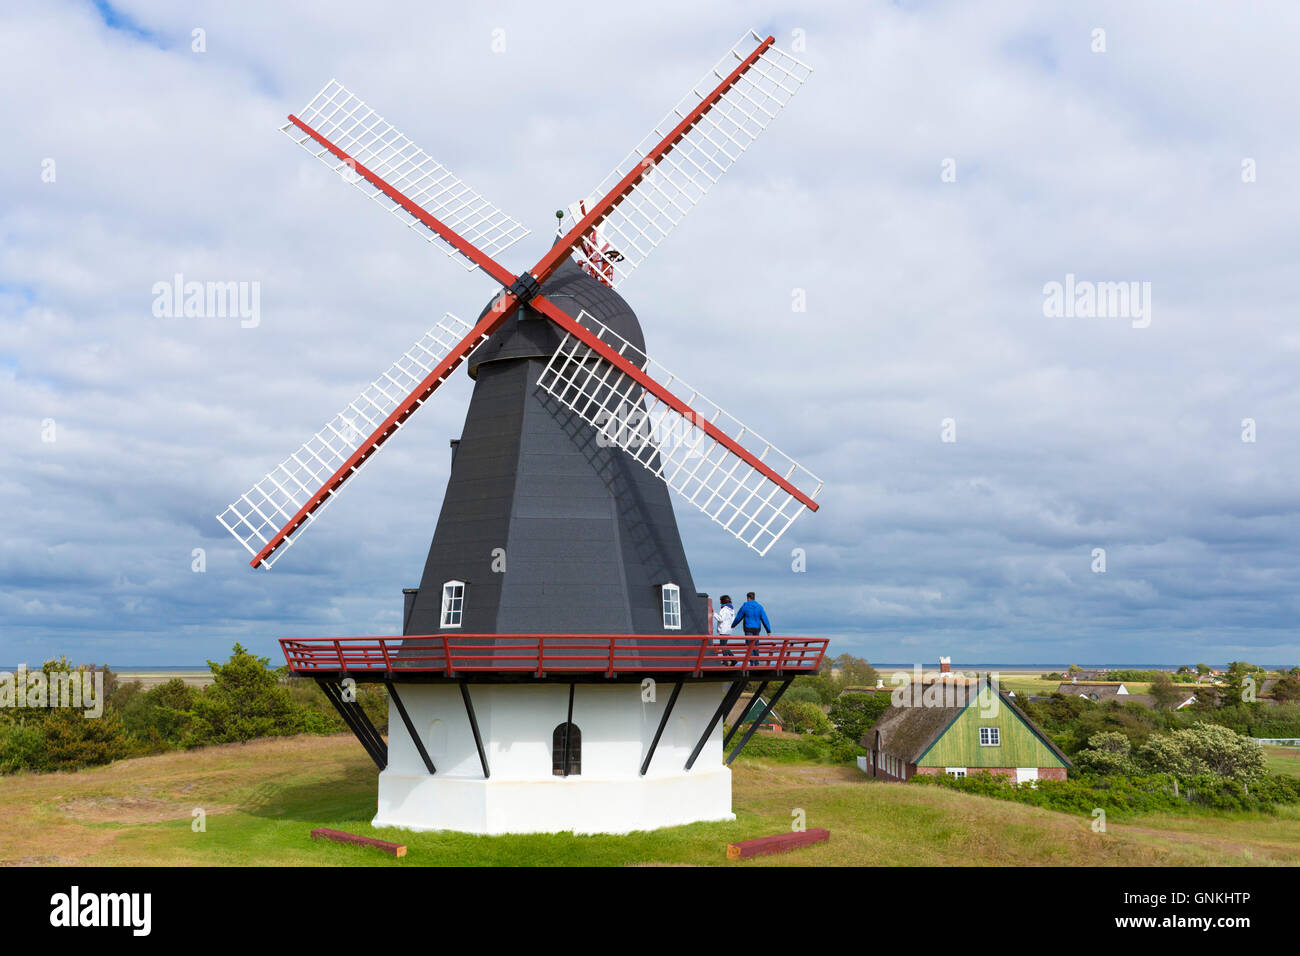 Molle Sonderho molino de energía eólica en la isla Fano - Fanoe - Sur de Jutlandia, Dinamarca Imagen De Stock